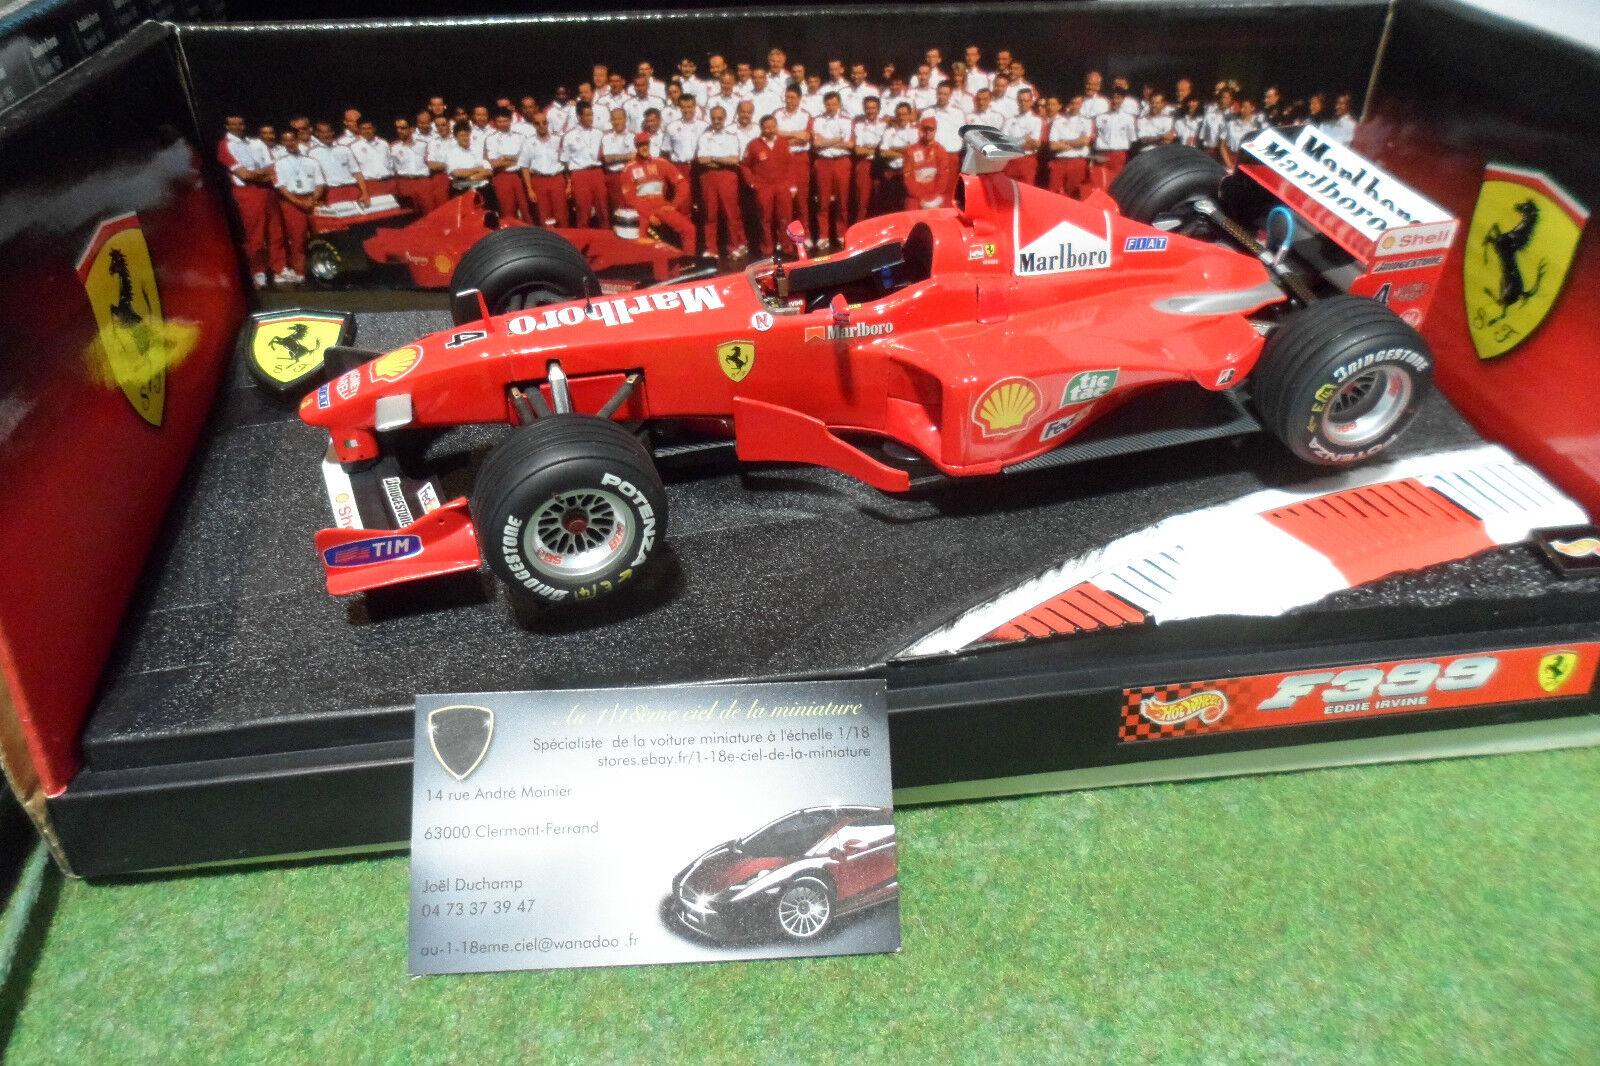 F1 FERRARI F399 1999 IRVINE   4 SPONSOR MARLBoro 1 18 HOT WHEELS 24629 formule 1